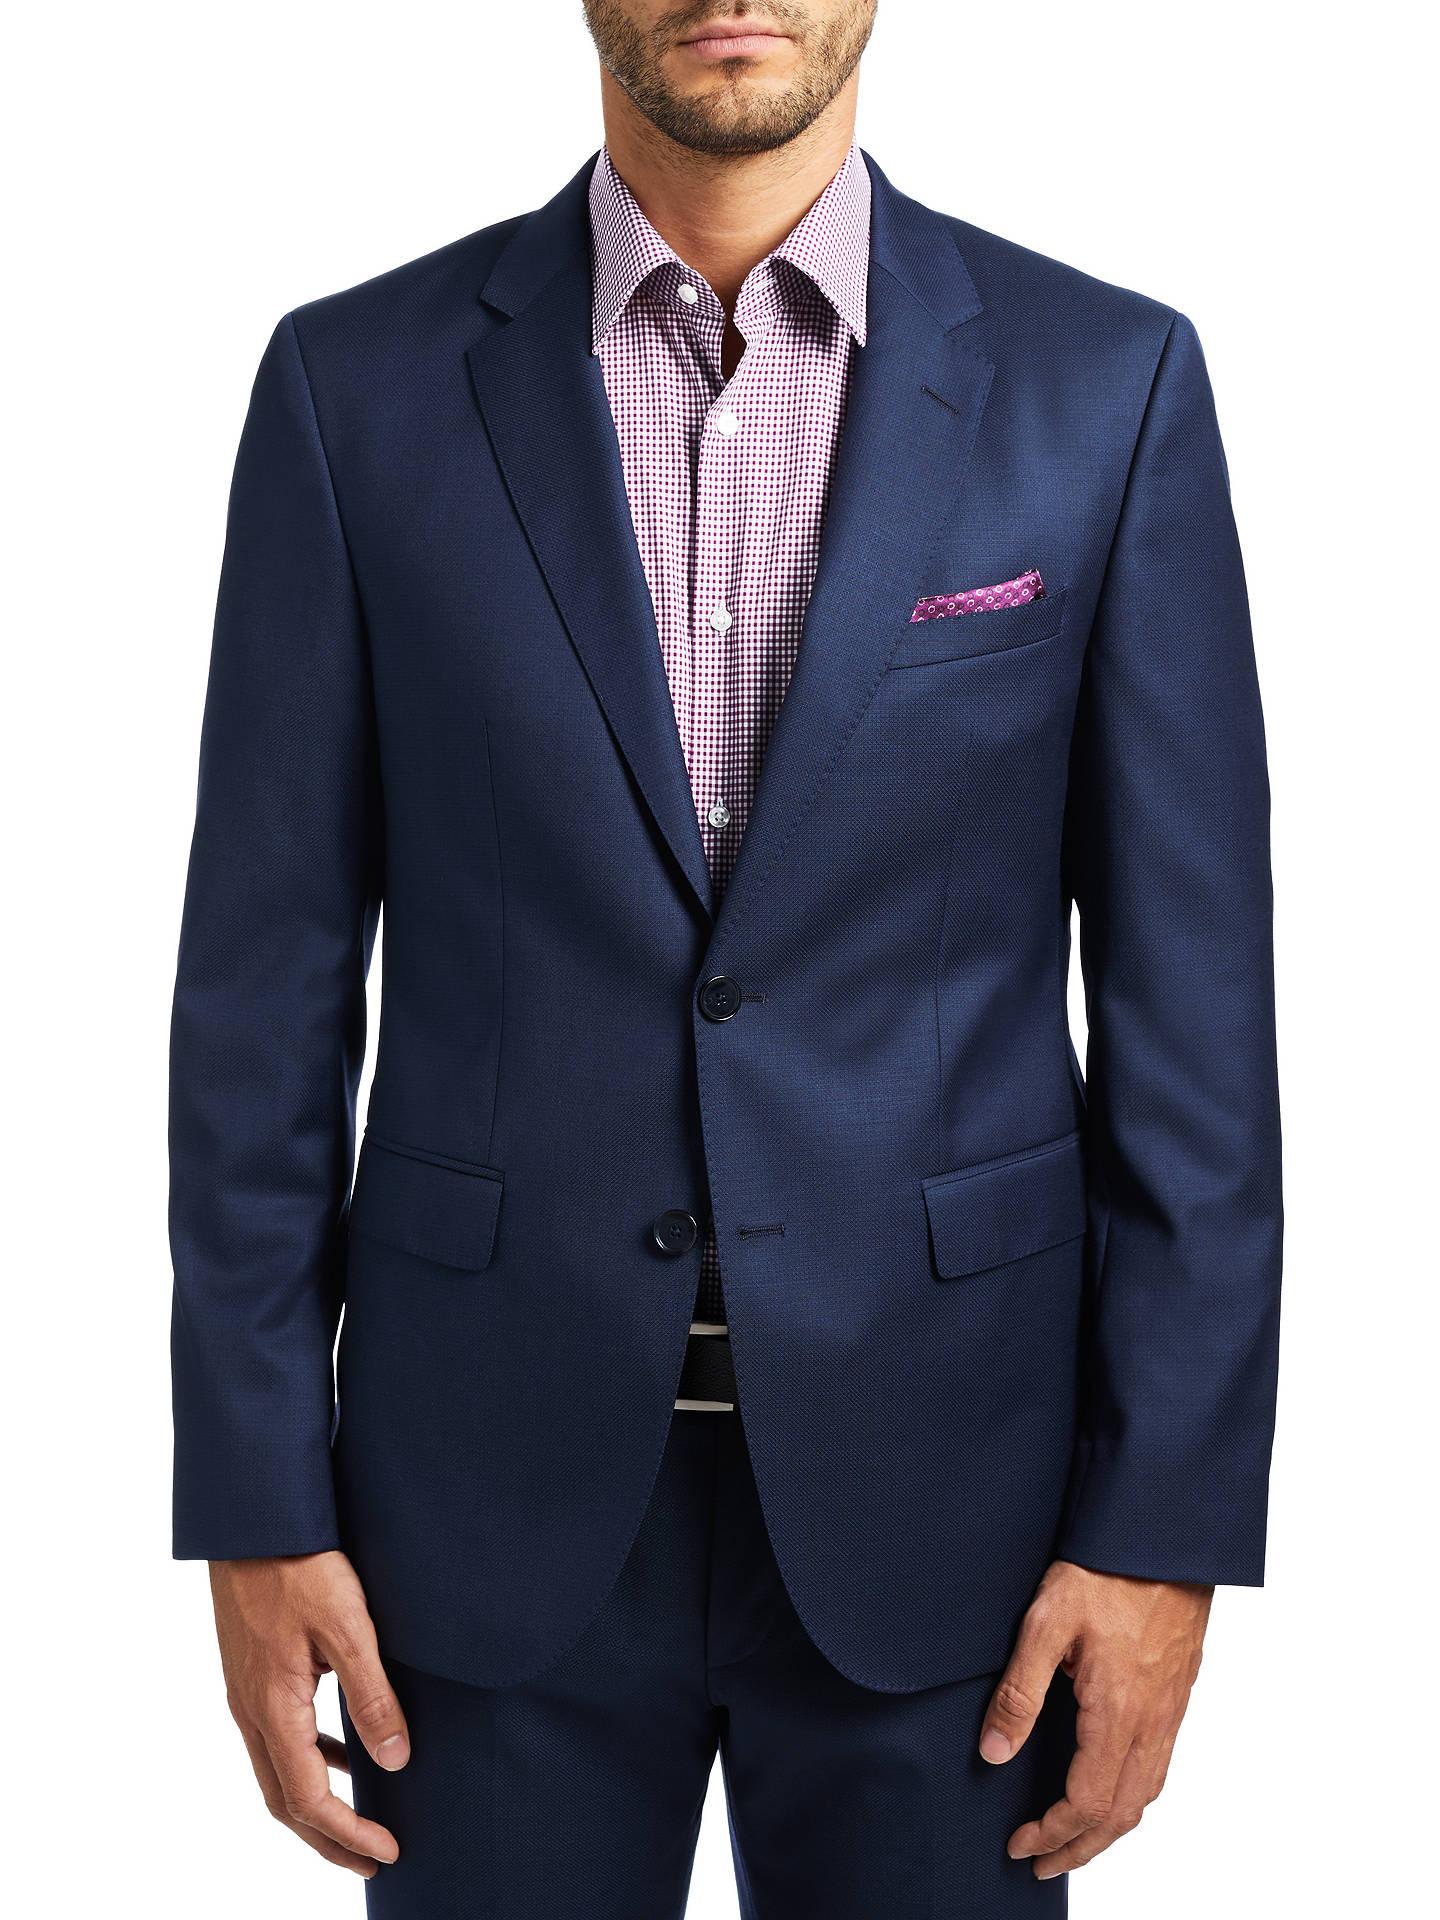 BuyHUGO by Hugo Boss C-Jeffery Wool Micro Pattern Regular Fit Suit Jacket bd0e02e3230